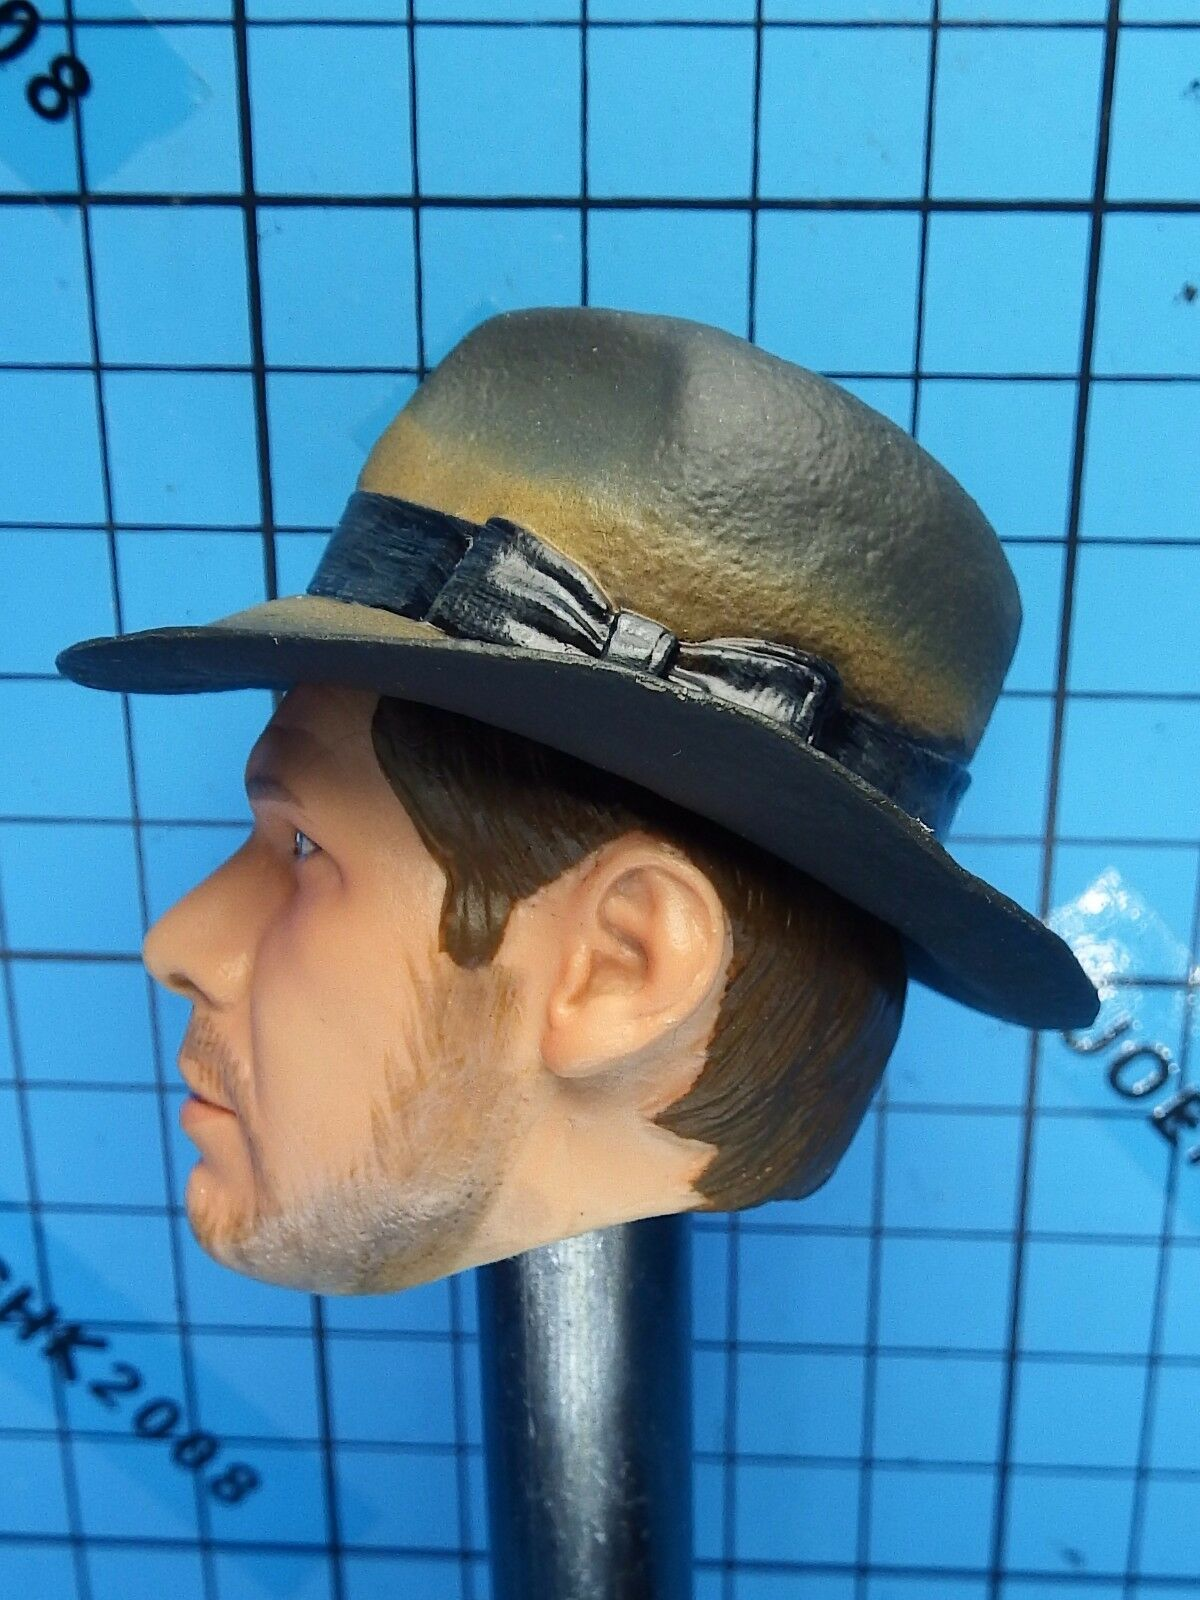 Sidemostrare 1 6 Indiana Jones Raiders Raiders Raiders of the Lost Ark cifra - Harrison Ford Head A 03ce72